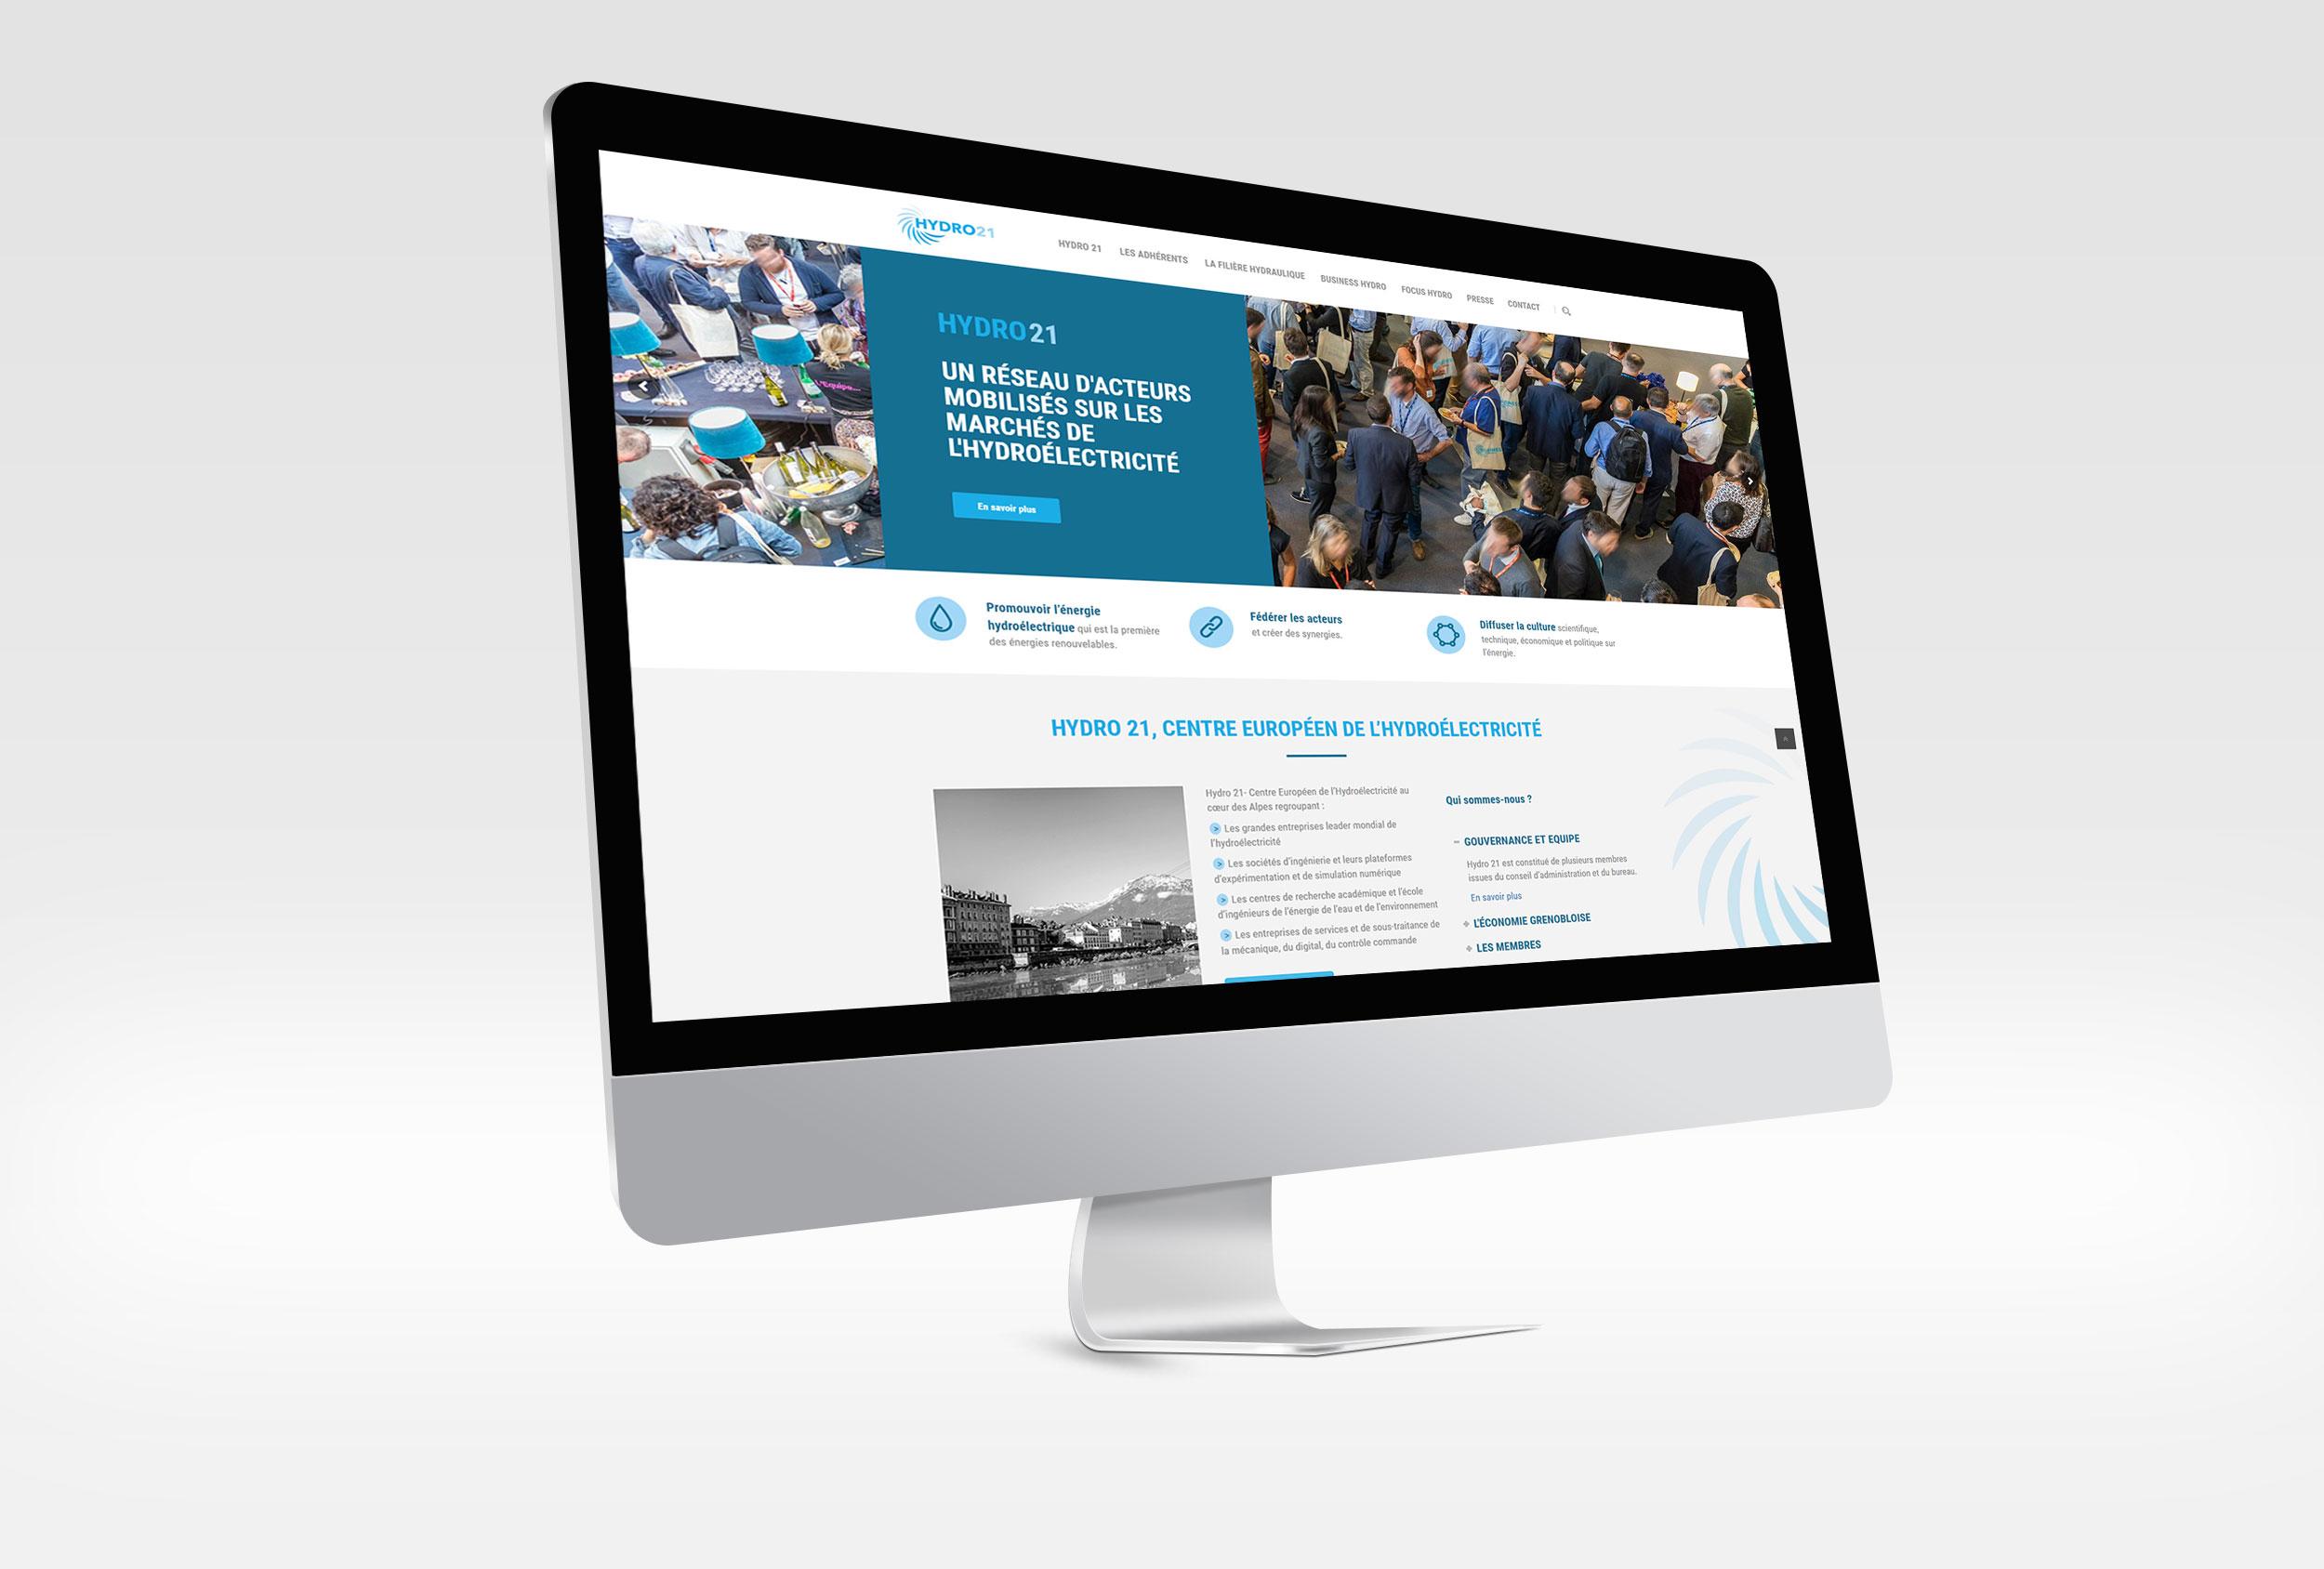 HYDRO 21 : Webmastering du site internet - Grenoble (38)